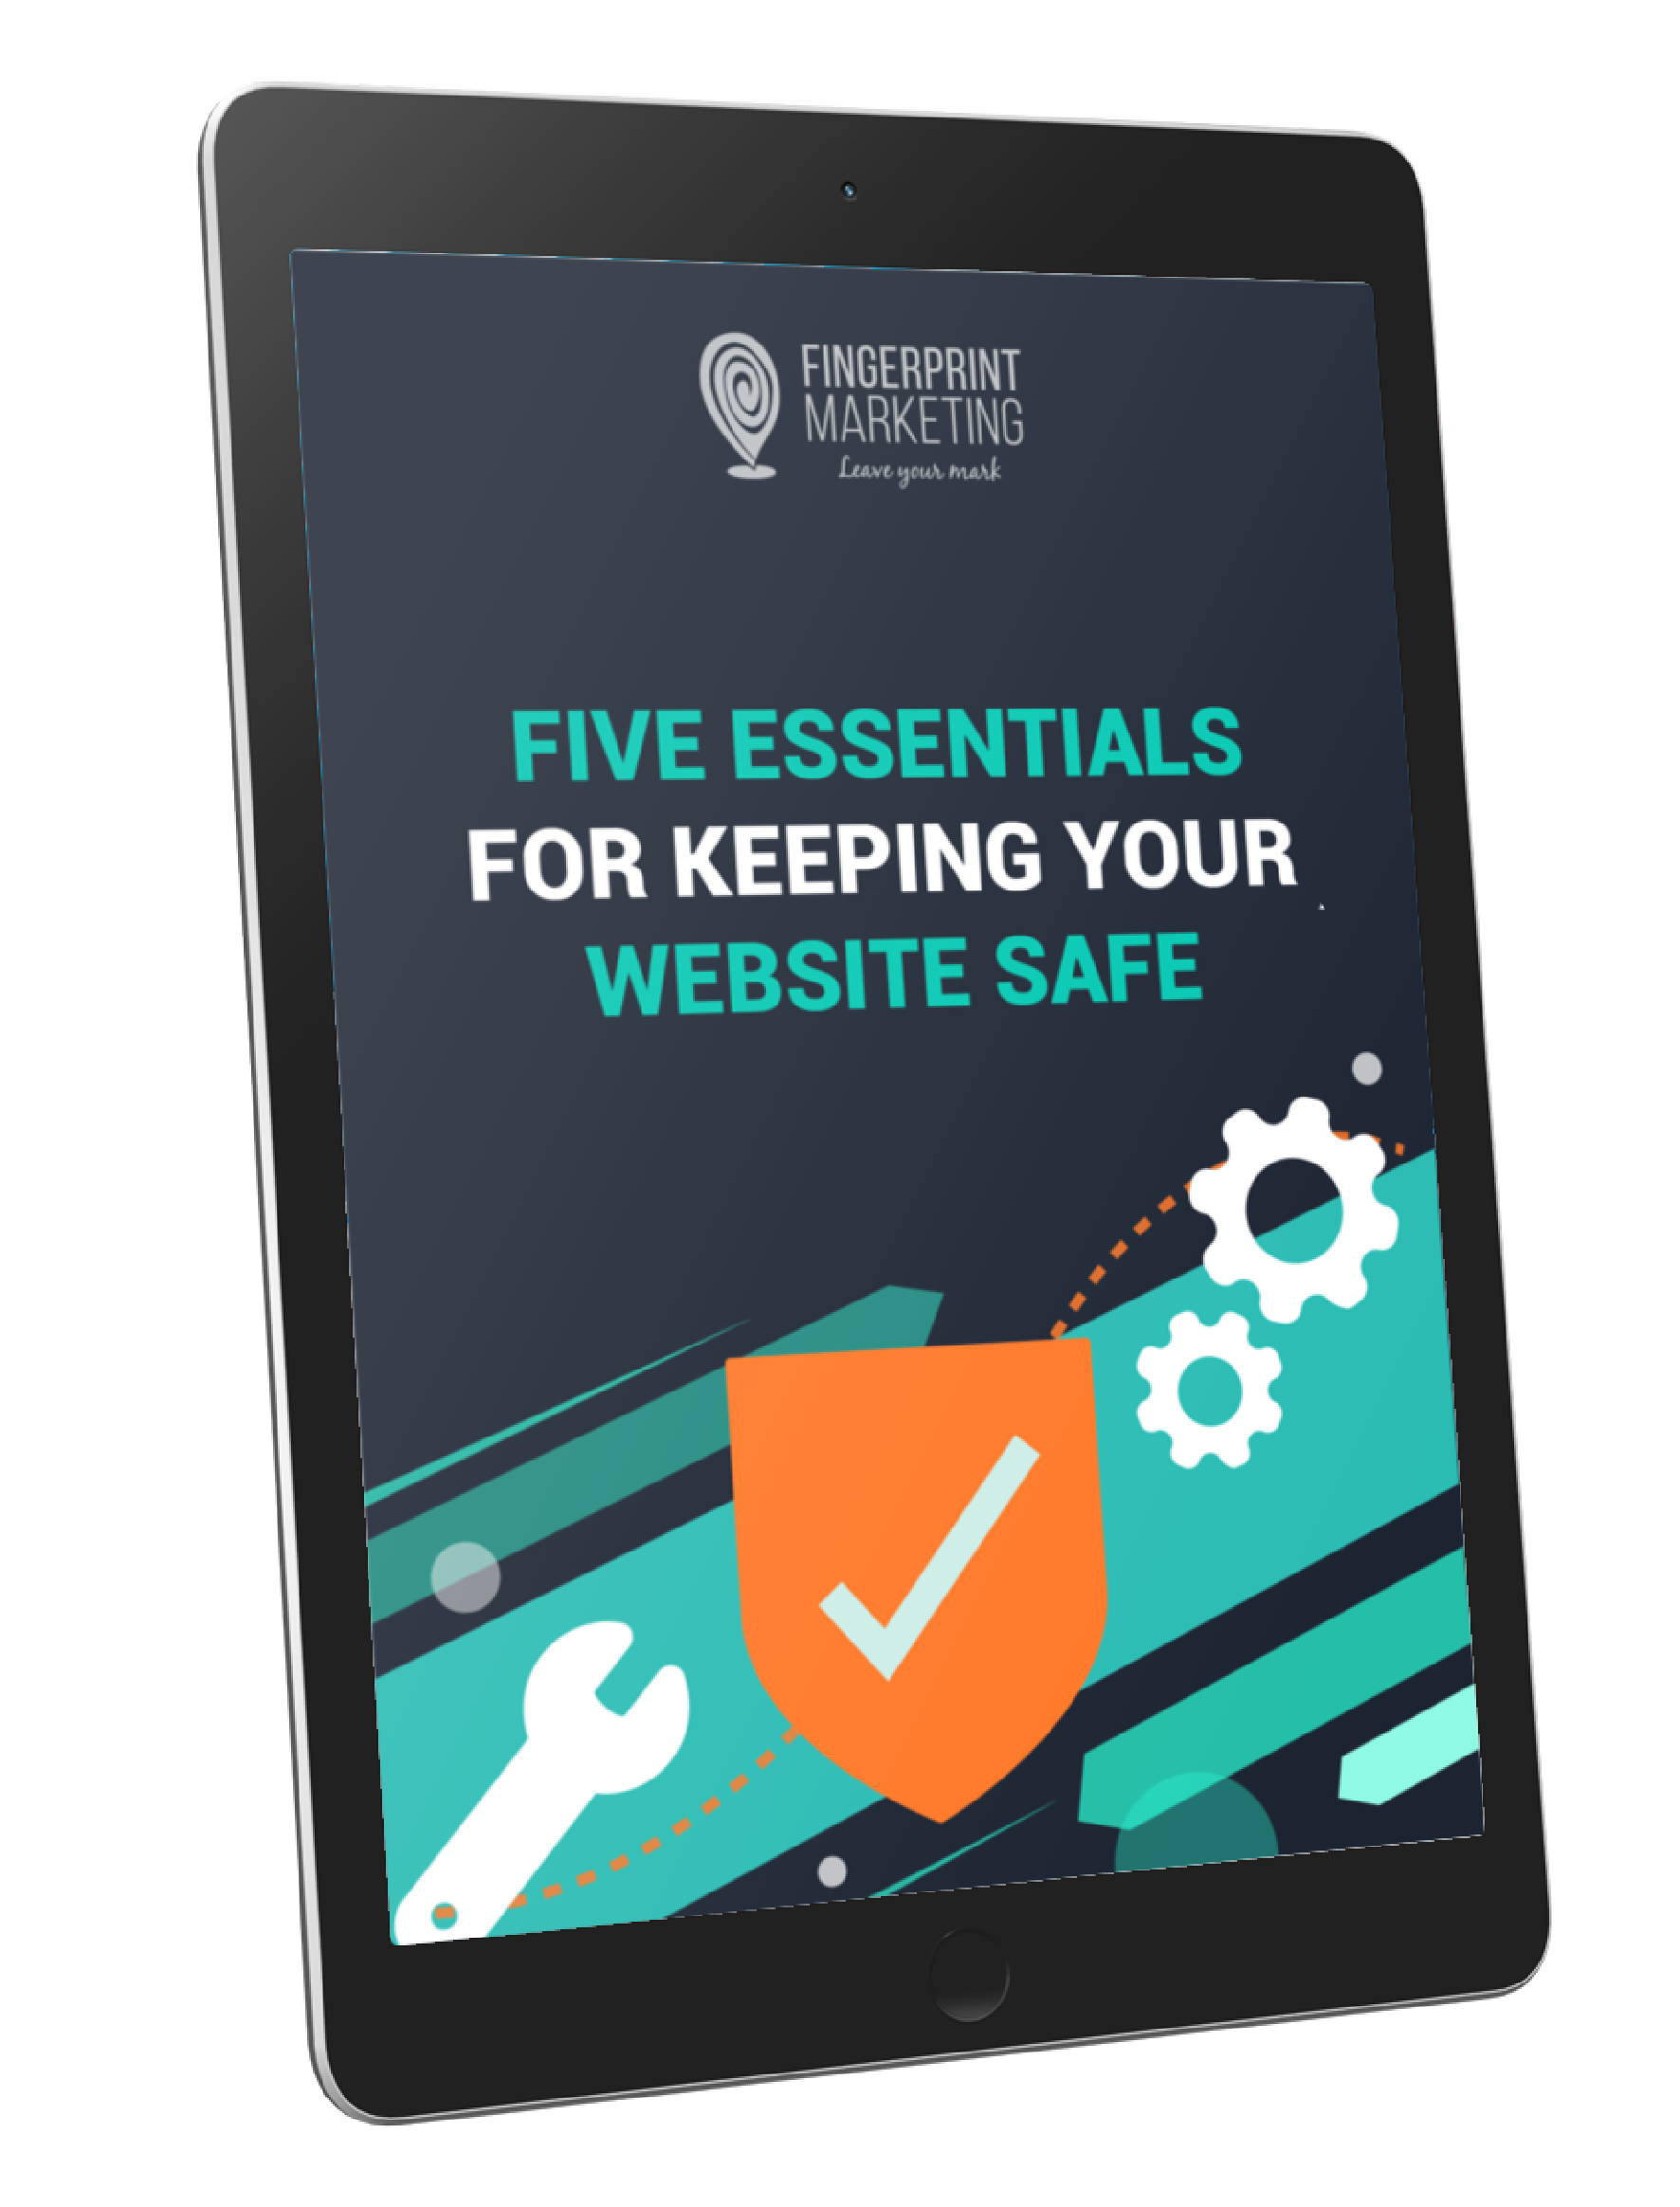 Five-Essentials-For-Keeping-Your-Website-Safe